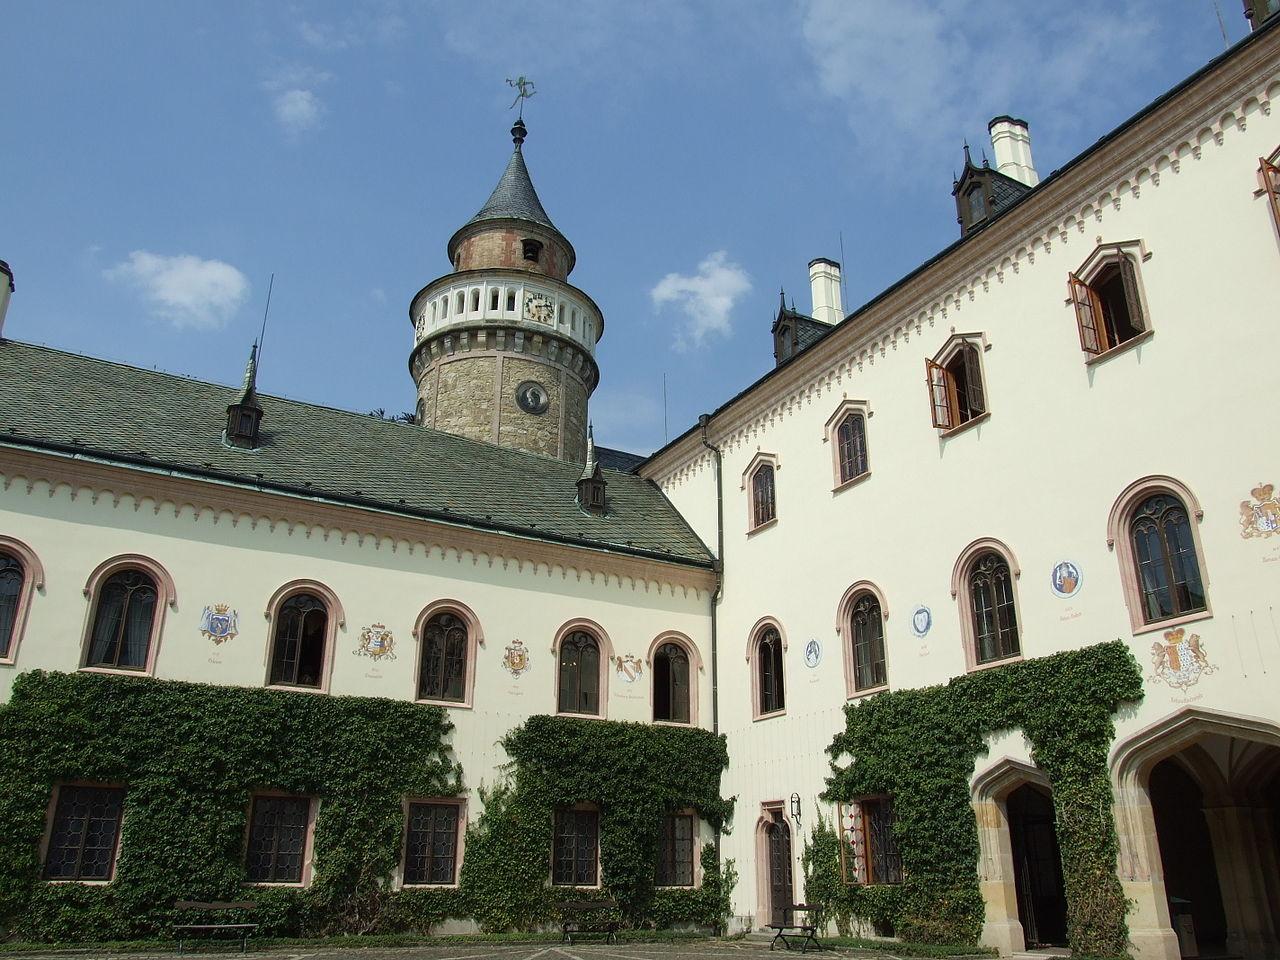 Замок Сихров, внутренний двор